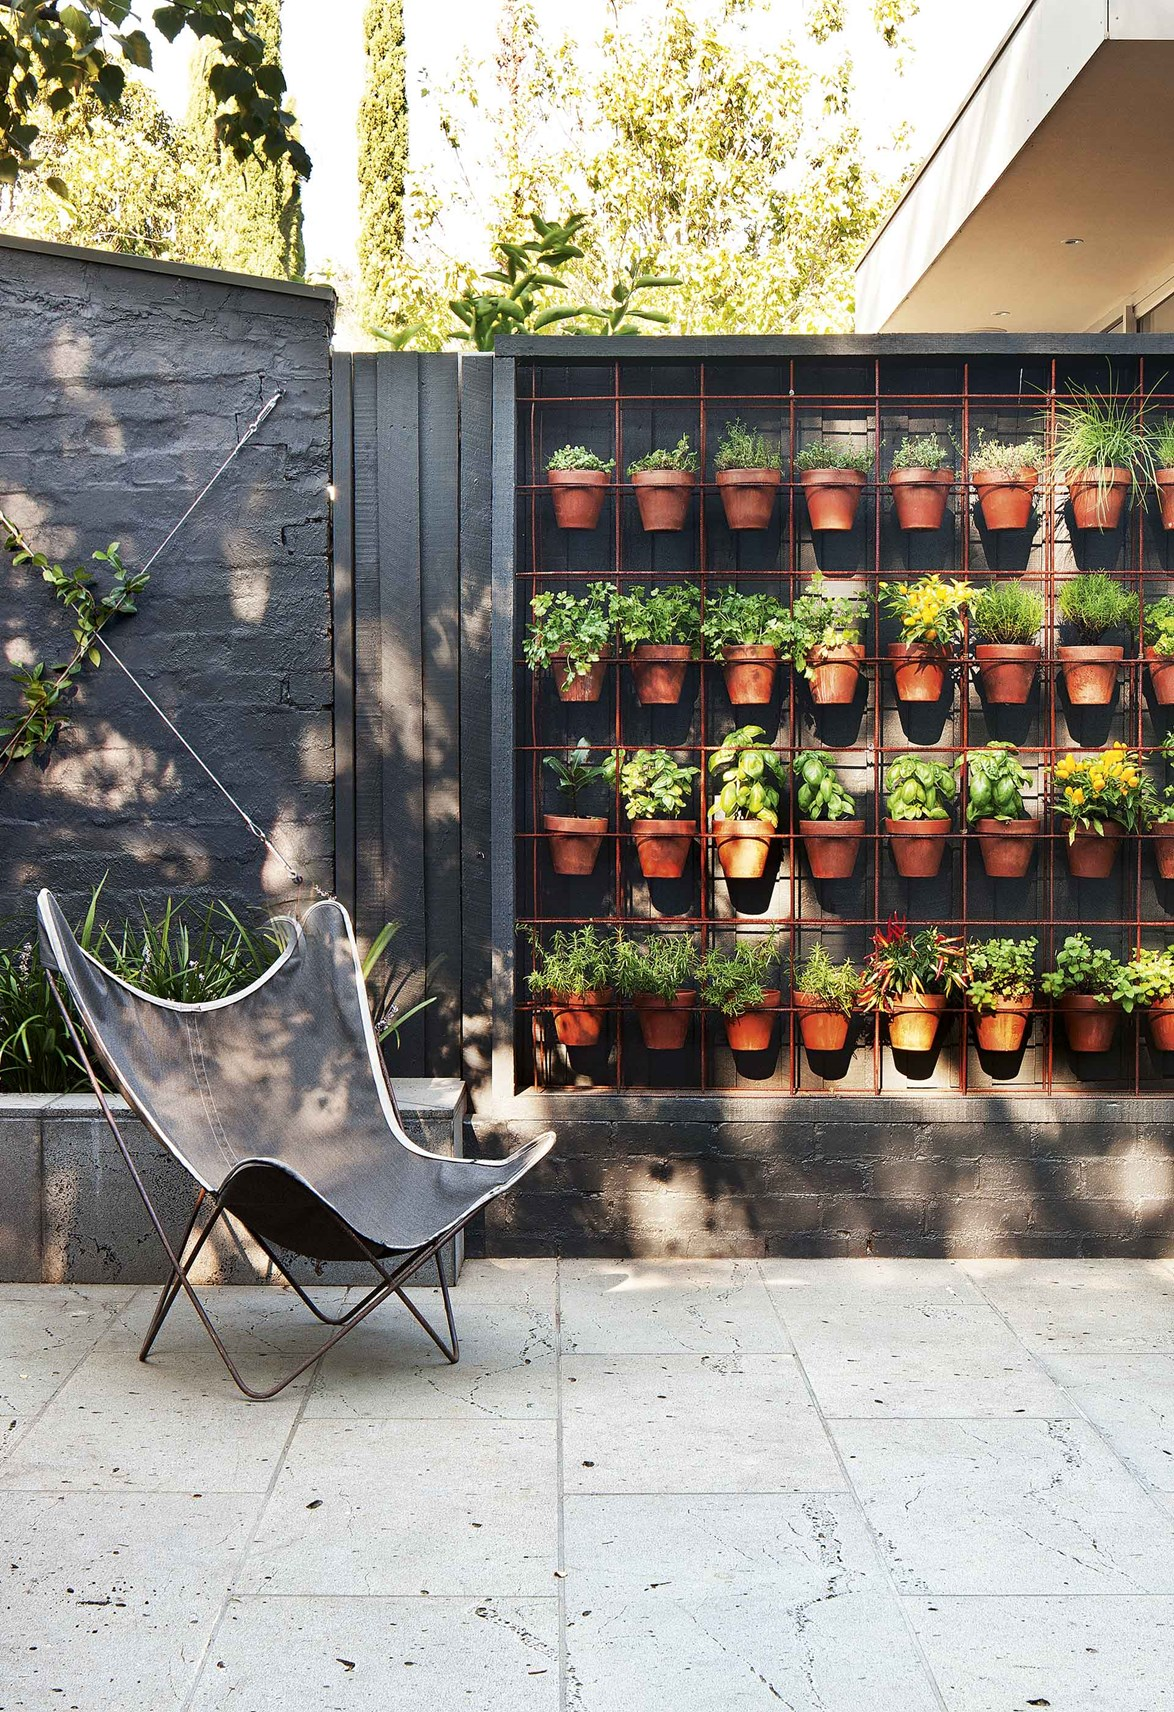 "Don't have room for a vegie garden? Try an [edible vertical garden](https://www.homestolove.com.au/7-best-plants-for-an-edible-vertical-garden-11942|target=""_blank"") instead!"